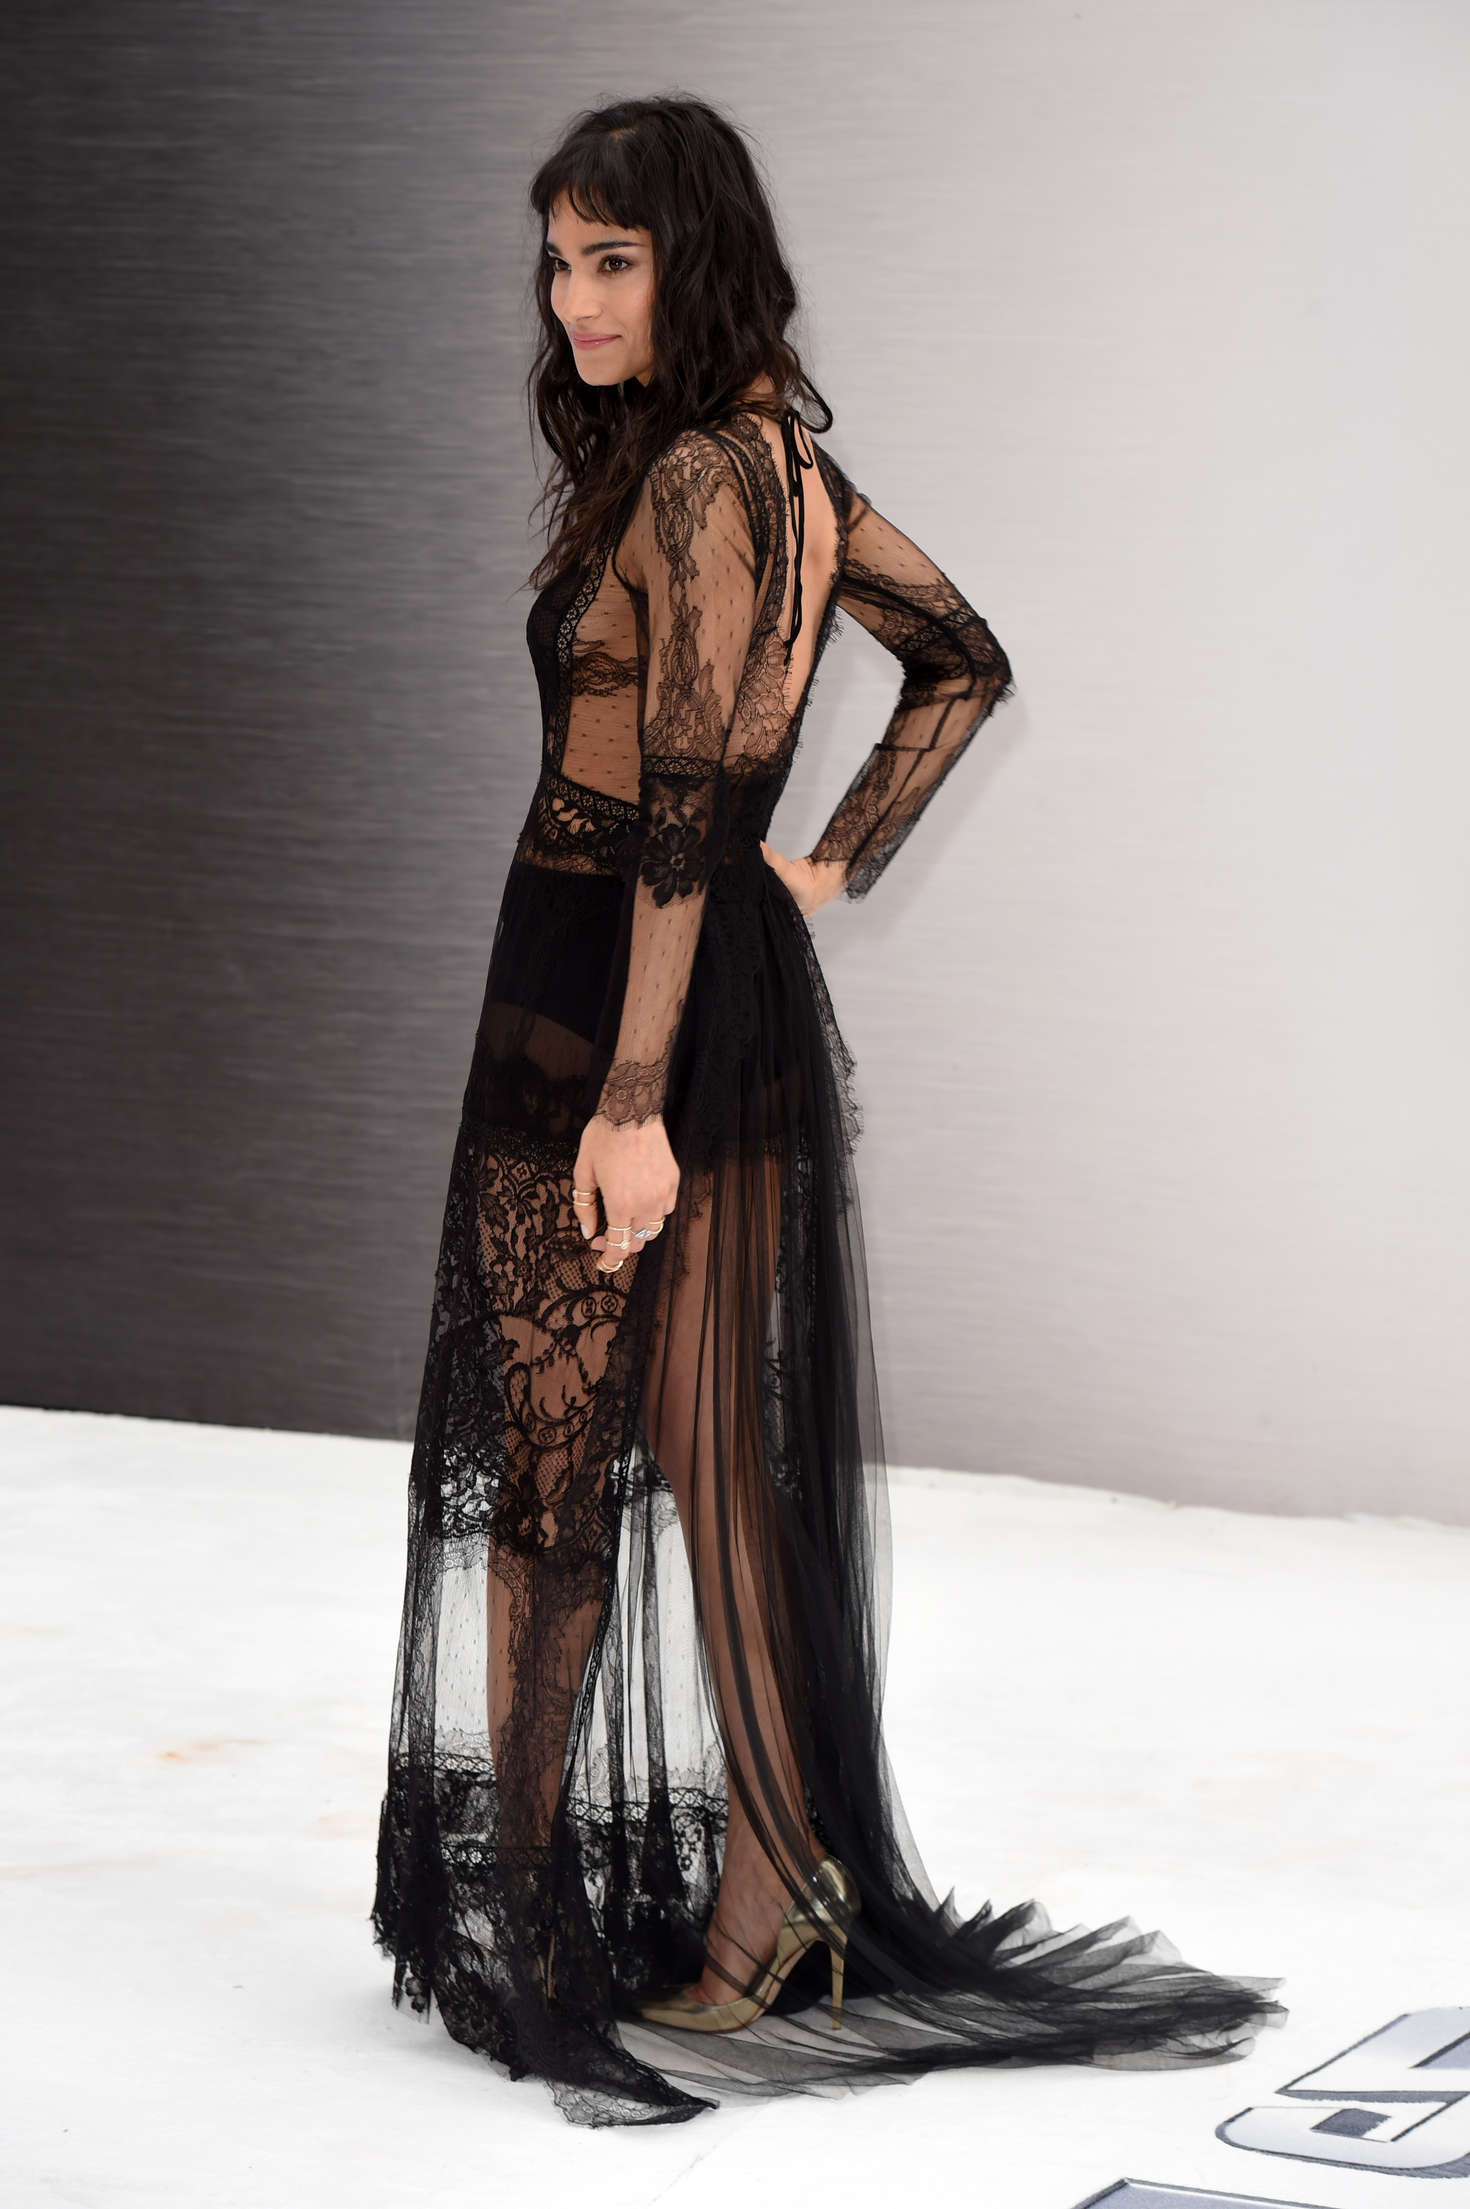 Sofia Boutella en robe de dentelle transparente